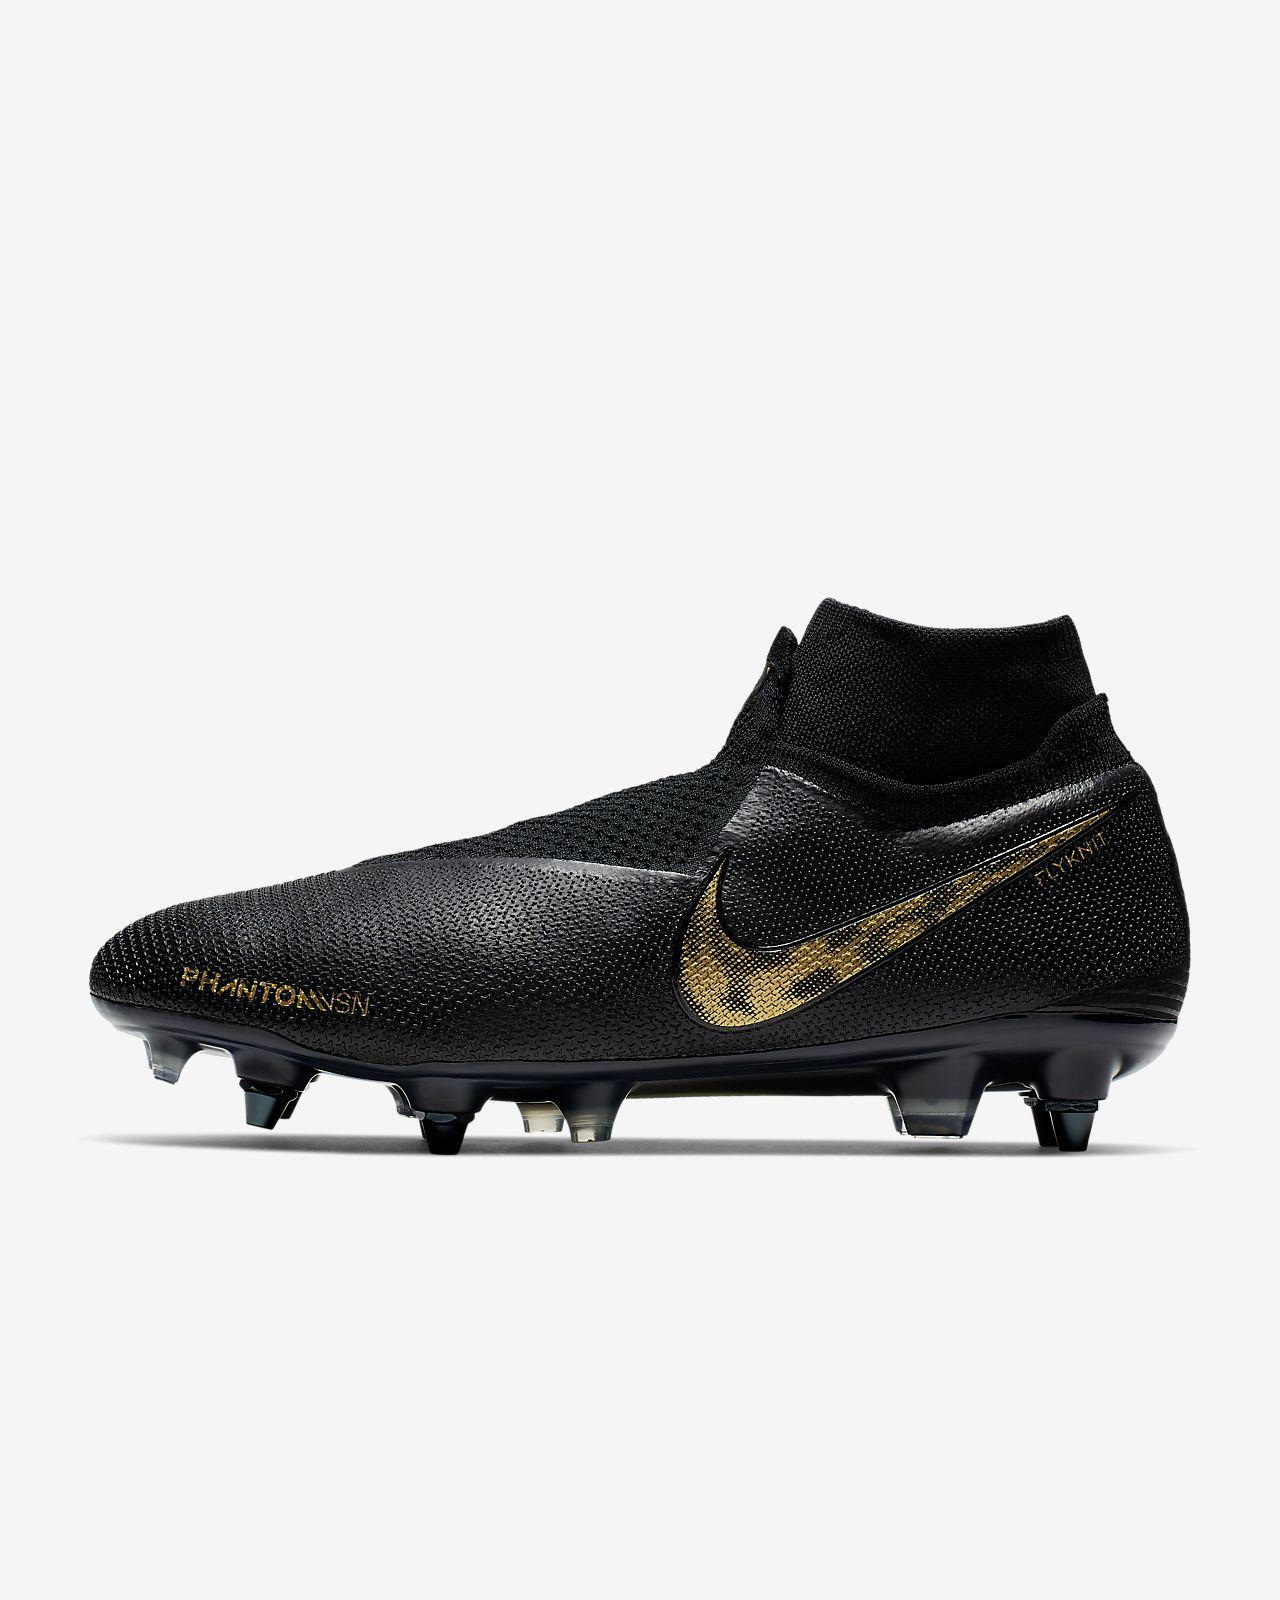 9dd490a51 Nike Phantom Vision Elite Dynamic Fit Anti-Clog SG-PRO Football Boot ...